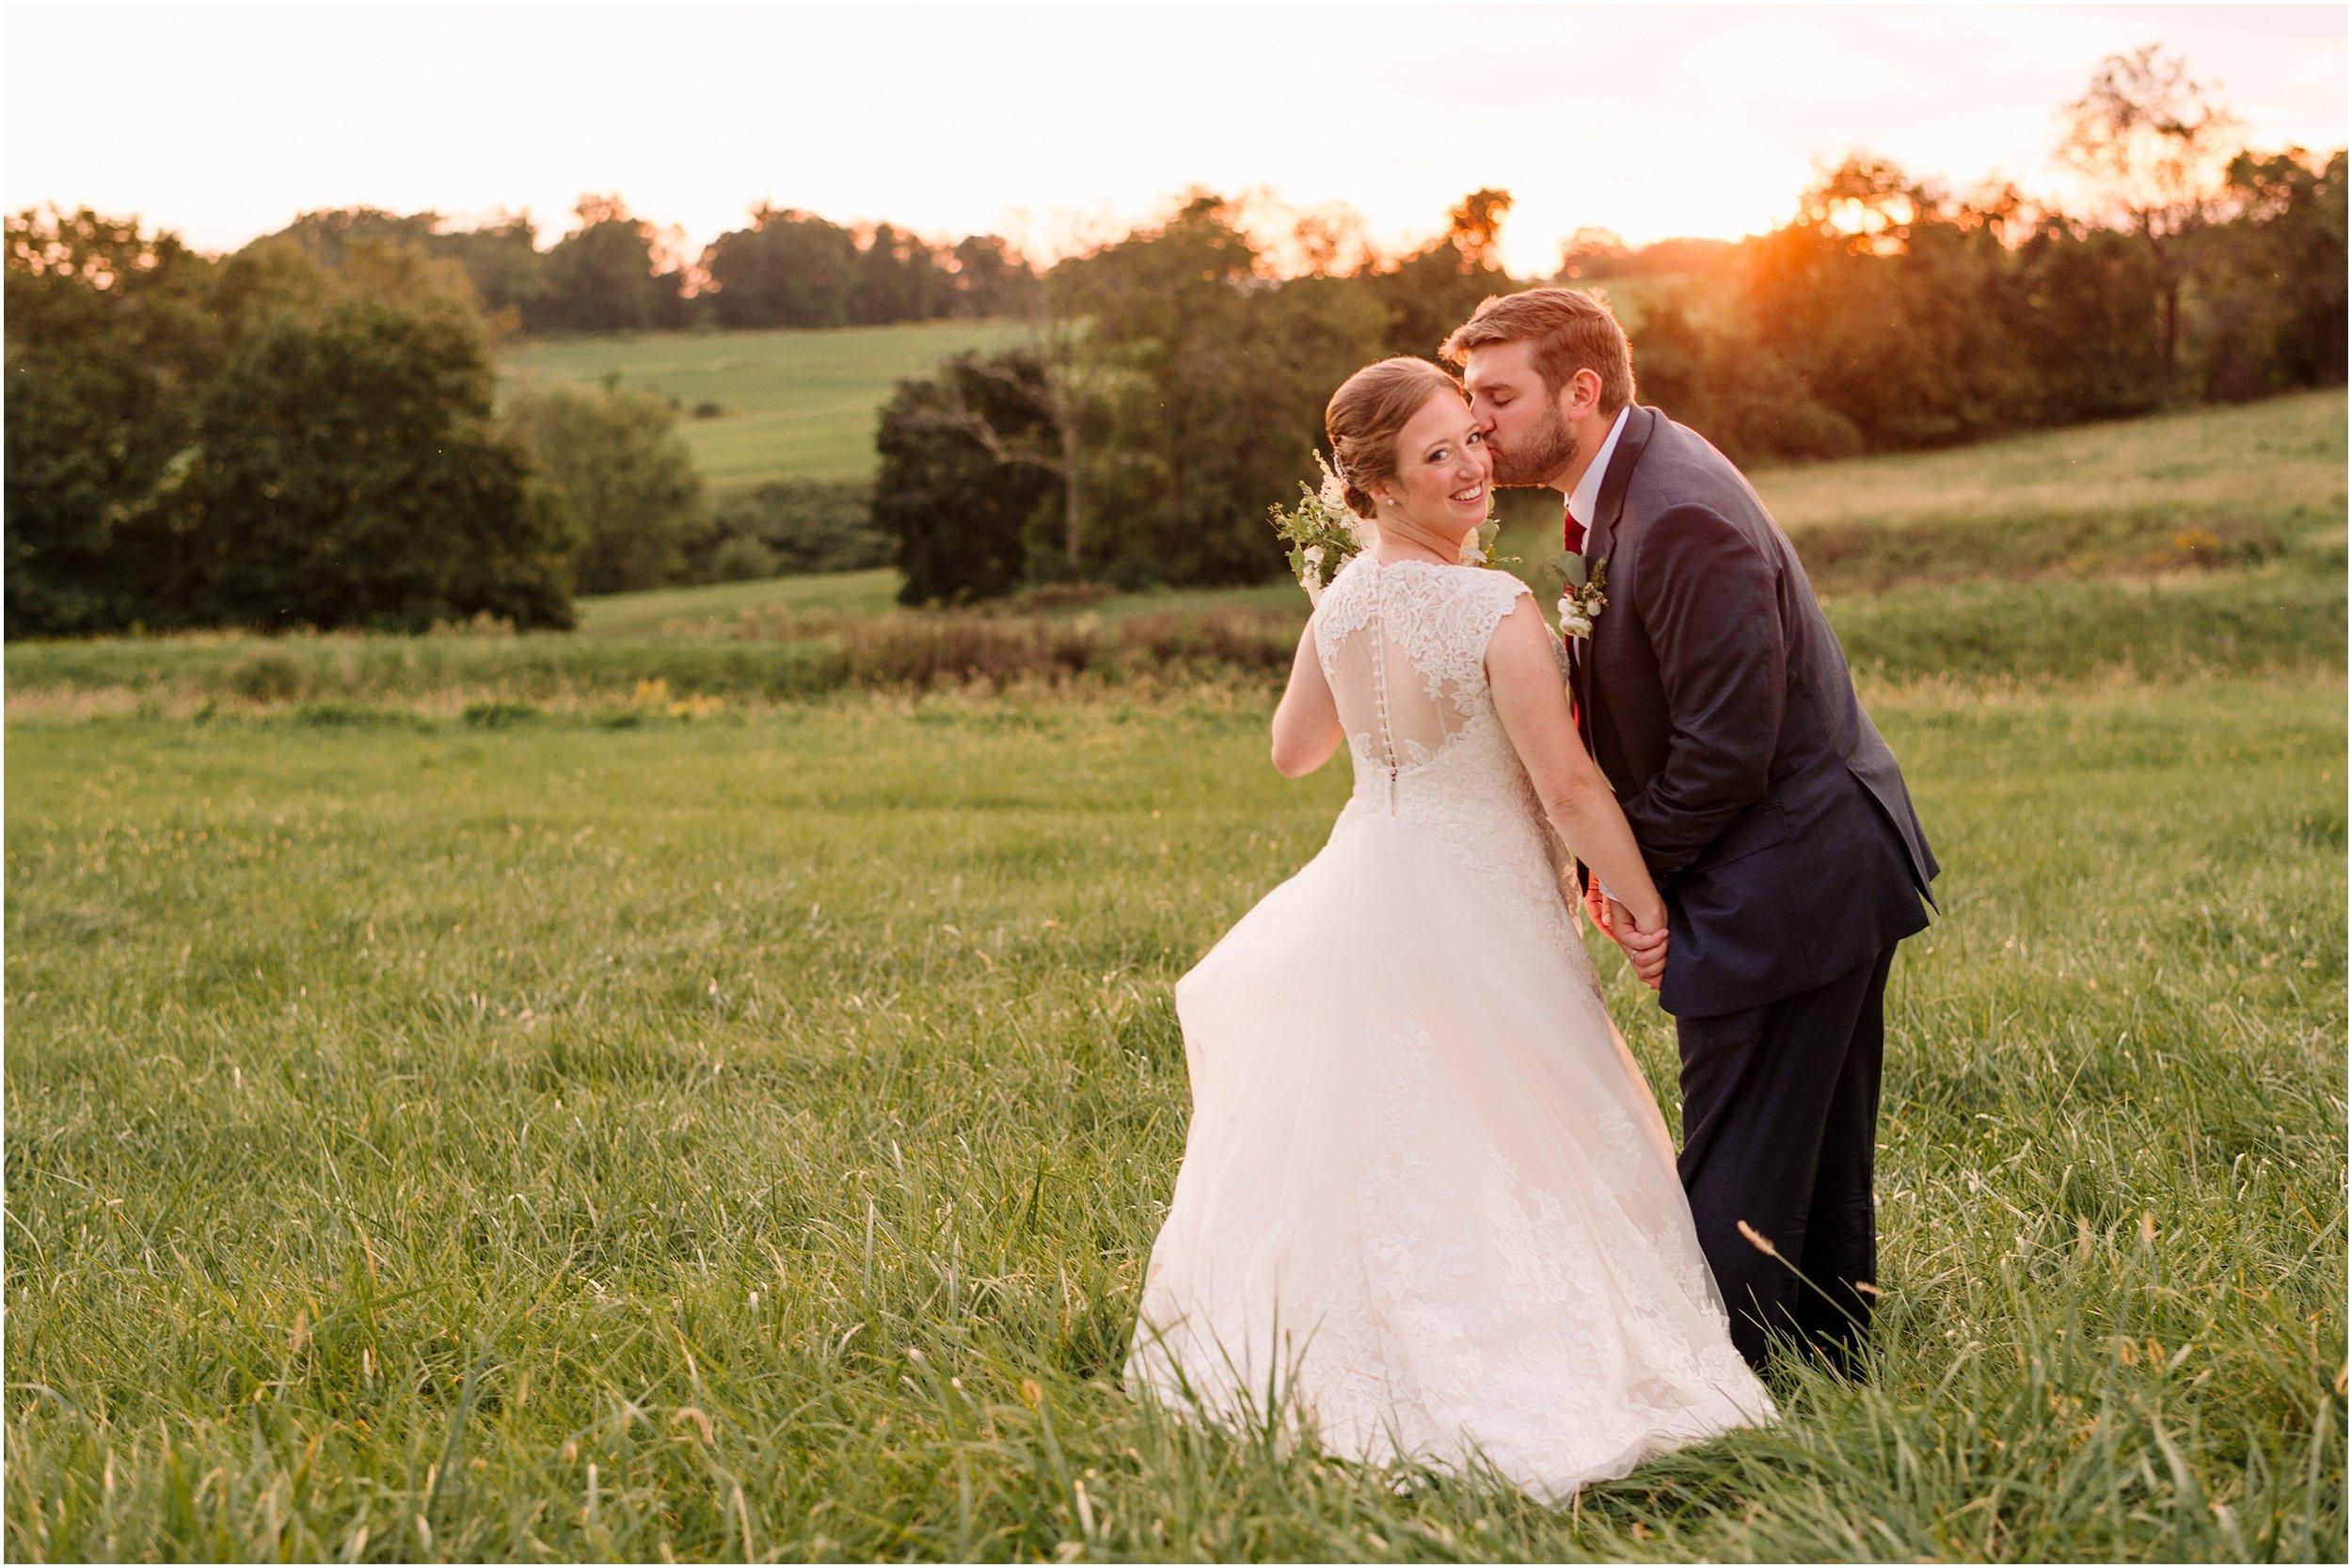 hannah leigh photography Wyndridge Farm Wedding York PA_1559.jpg